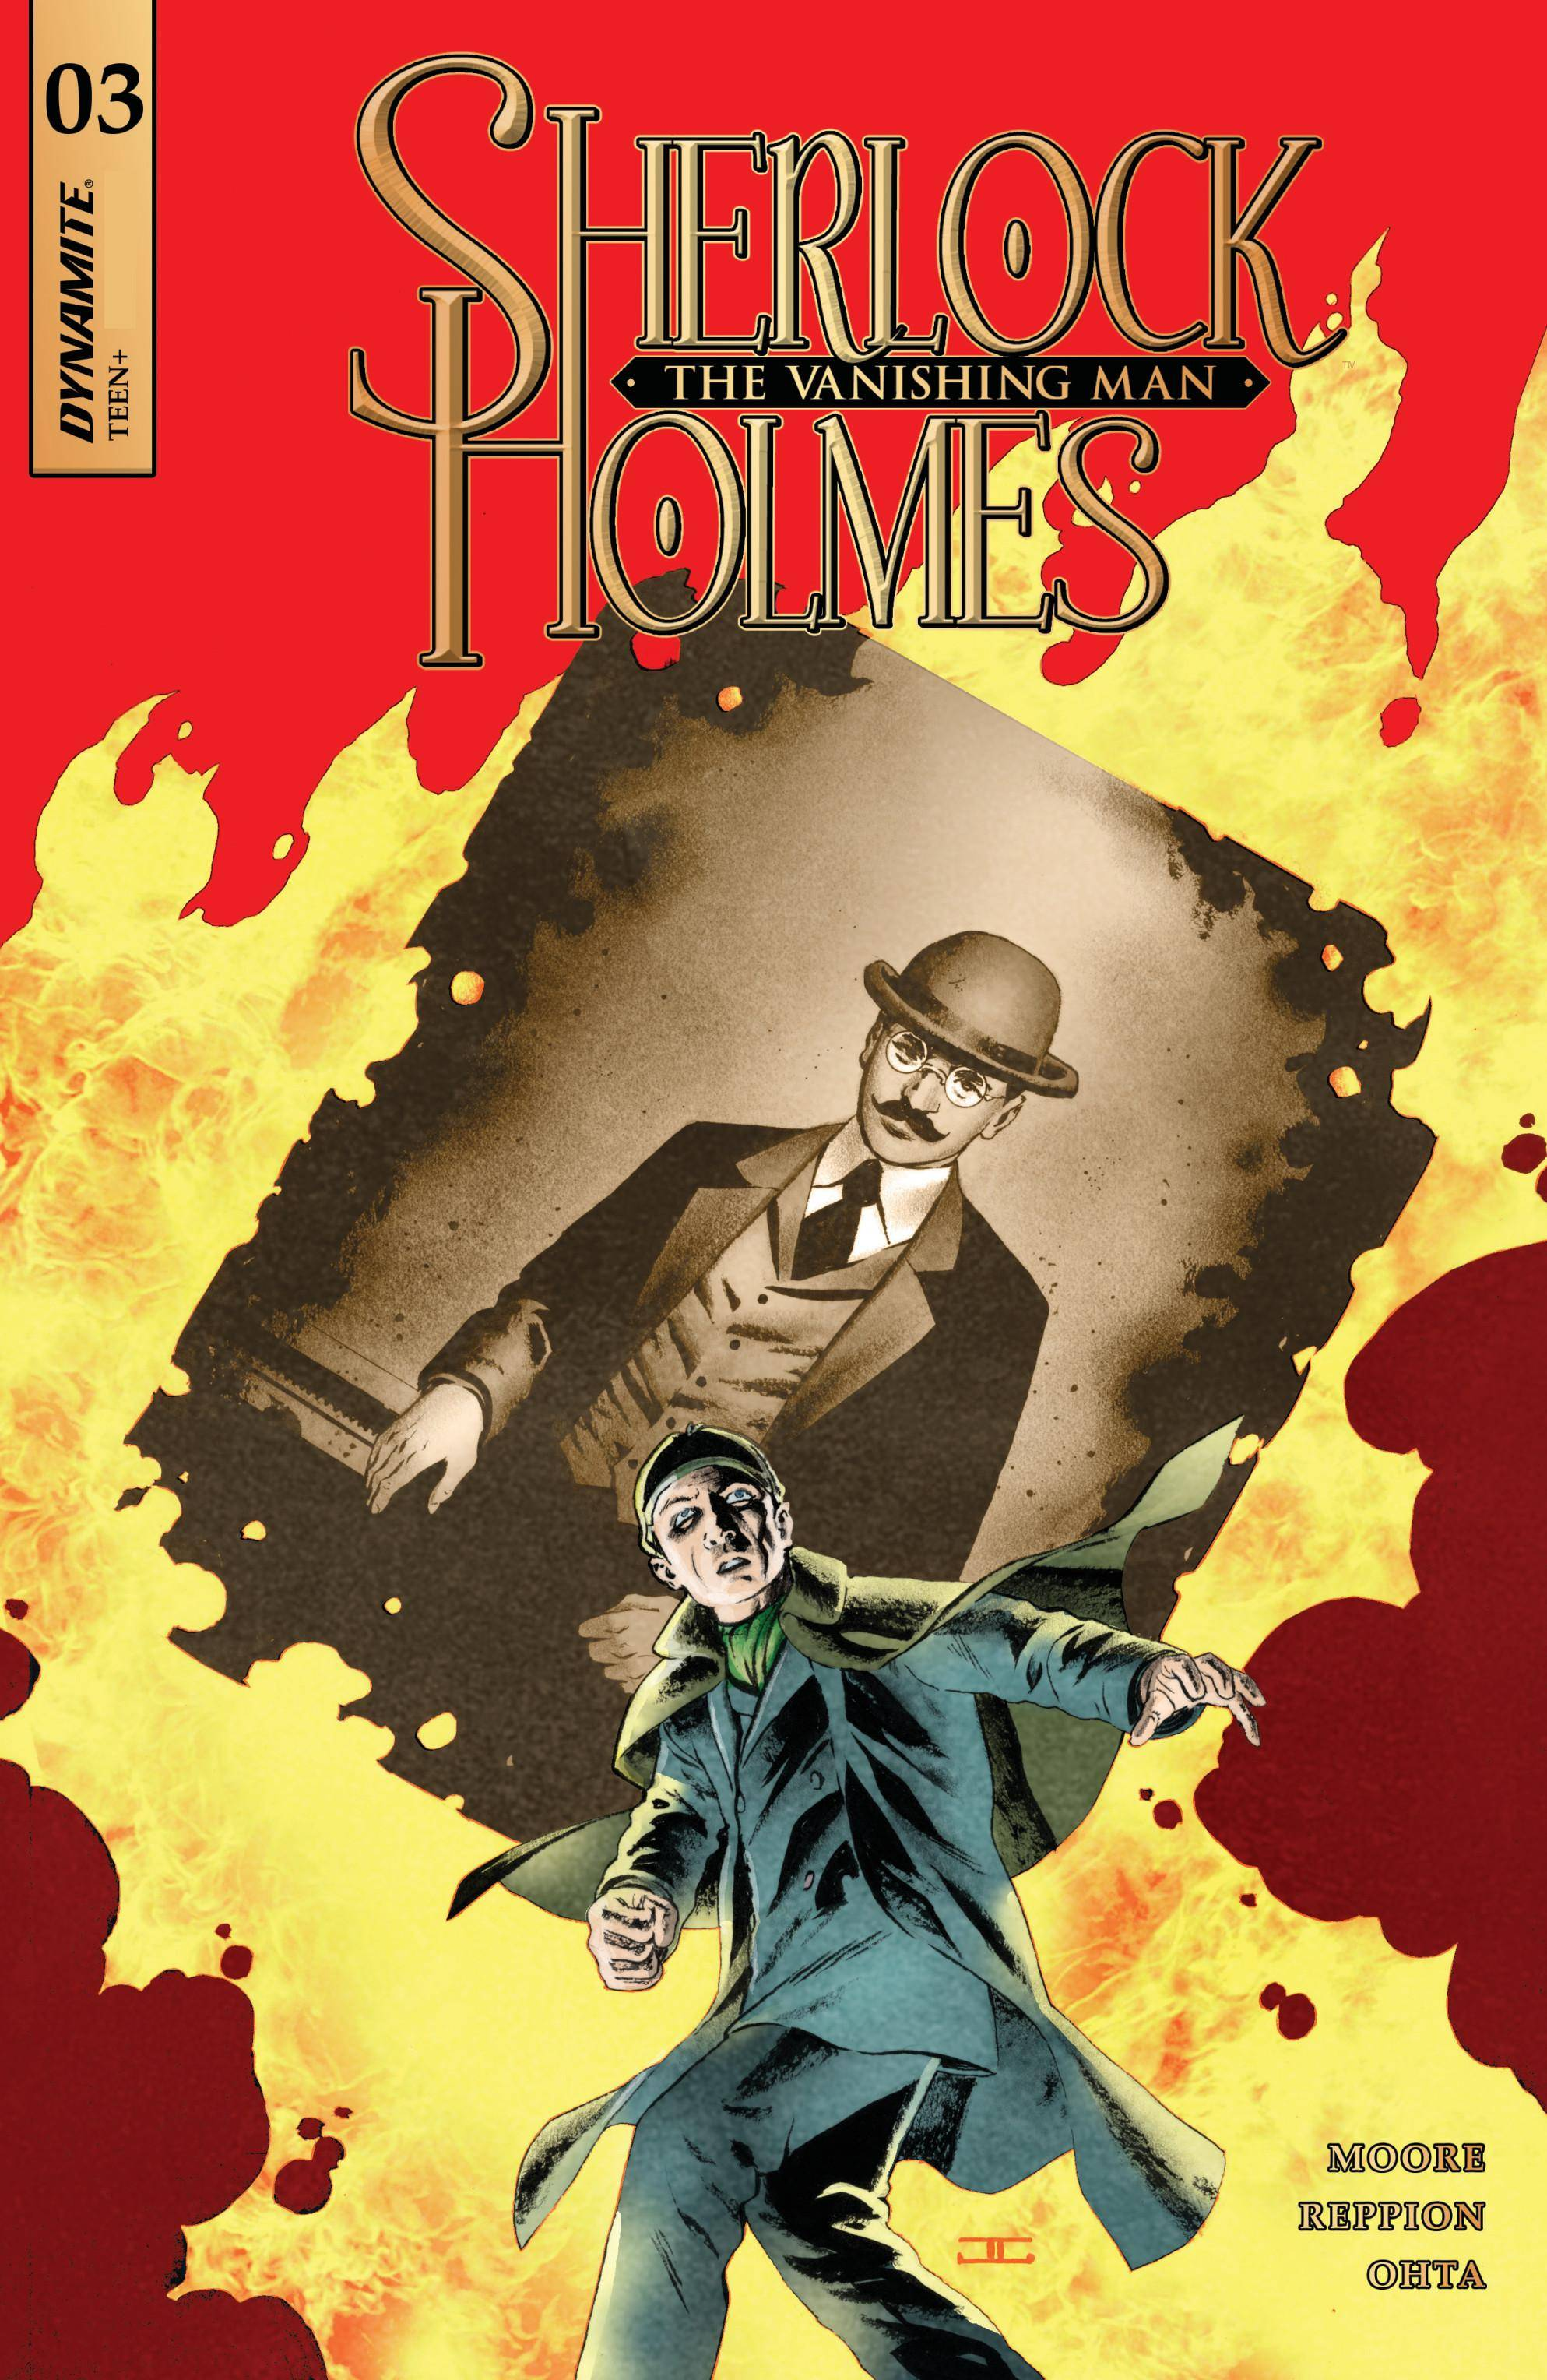 Sherlock.Holmes-The.Vanishing.Man.003.2018.digital.Son.of.Ultron-Empire